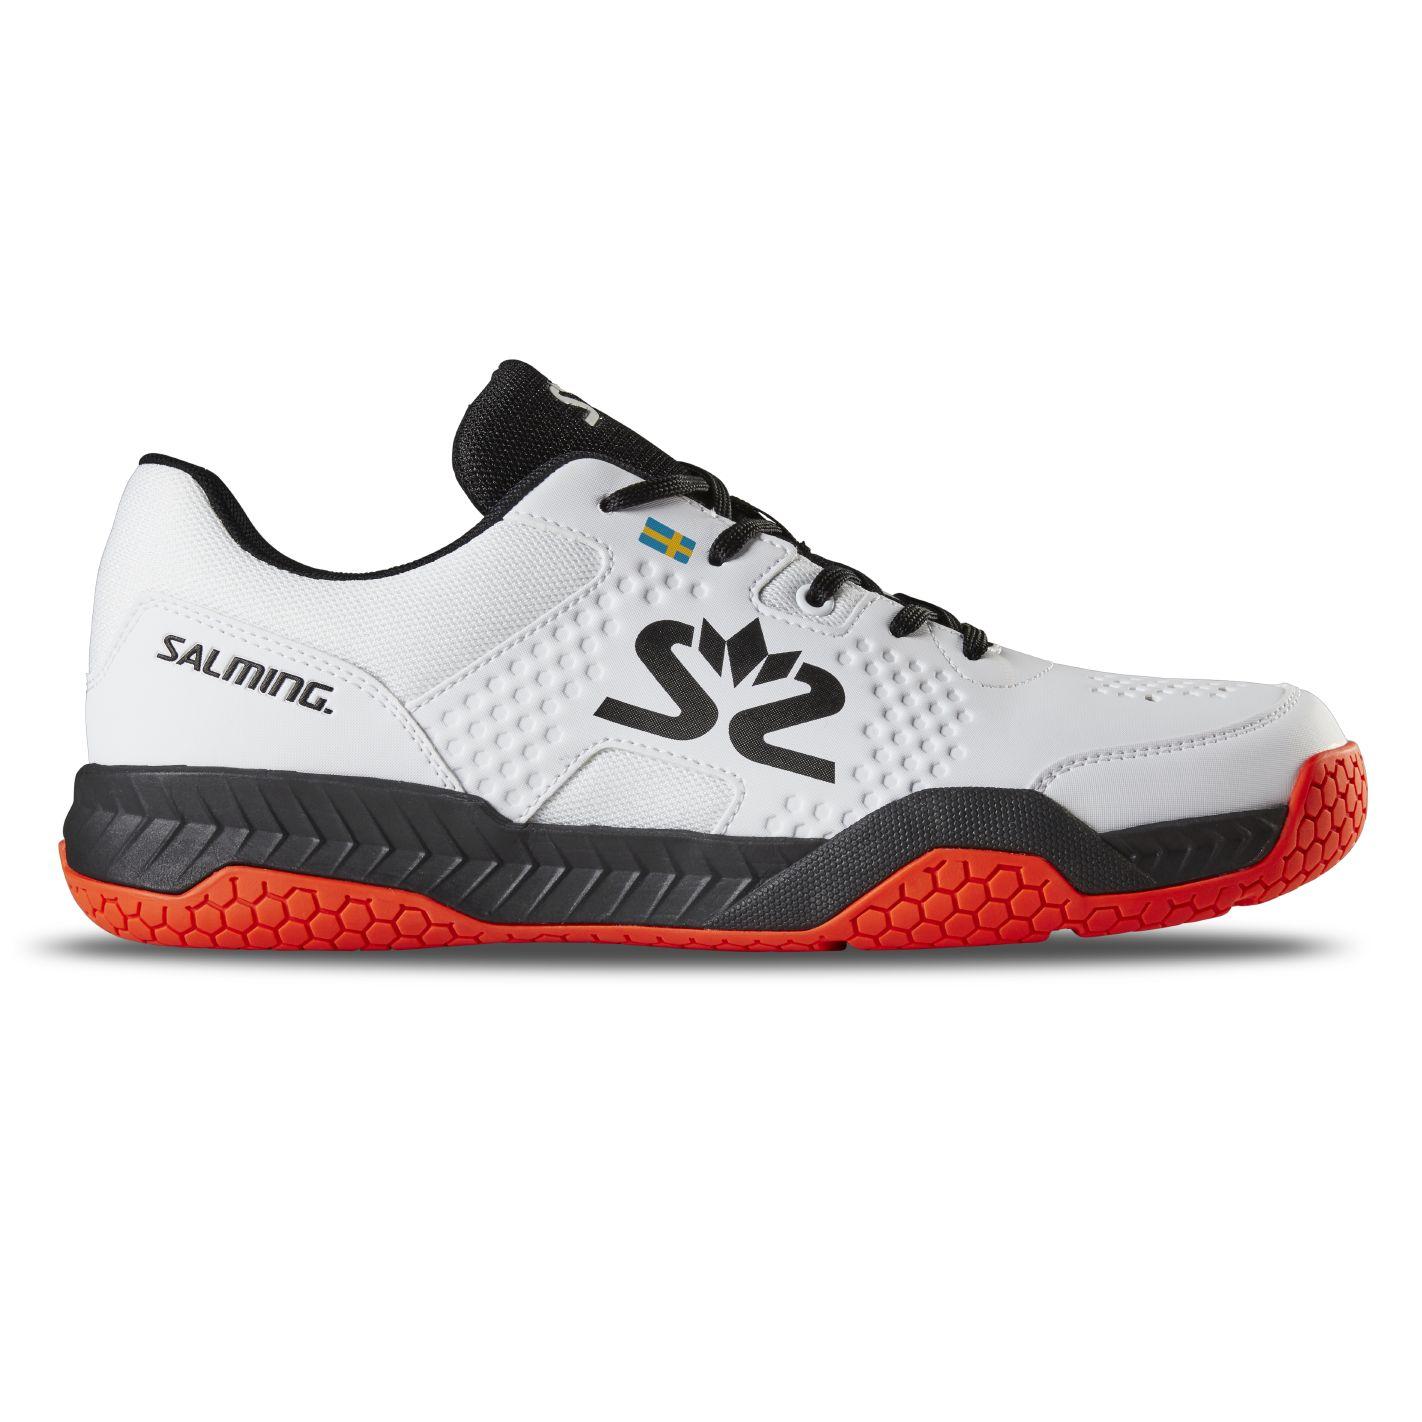 Salming Hawk Court Shoe Men White/Black 11,5 UK - 47 1/3 EUR - 30,5 cm